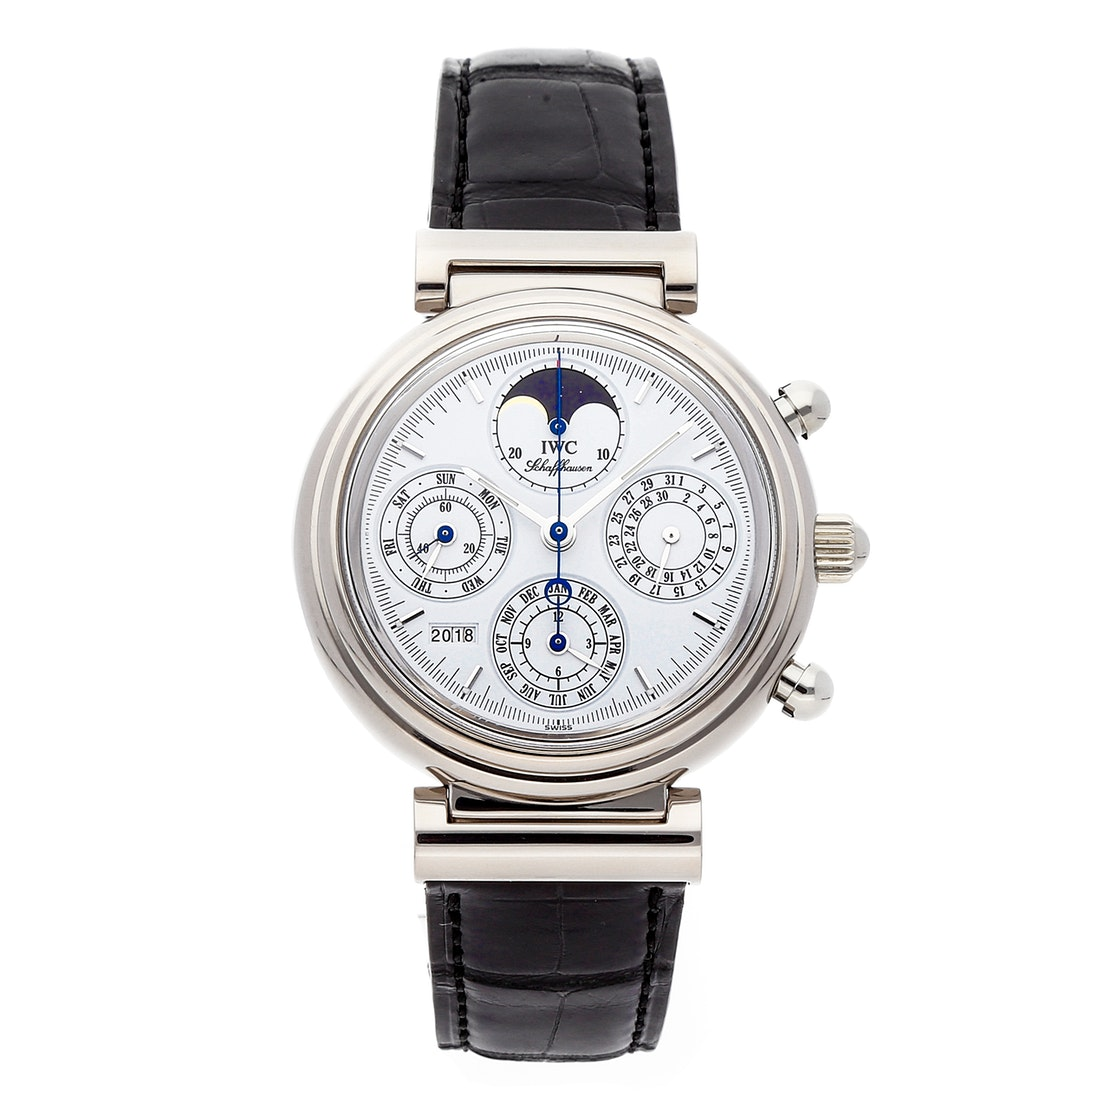 IWC DaVinci Perpetual Calendar Chronograph IW3750-06